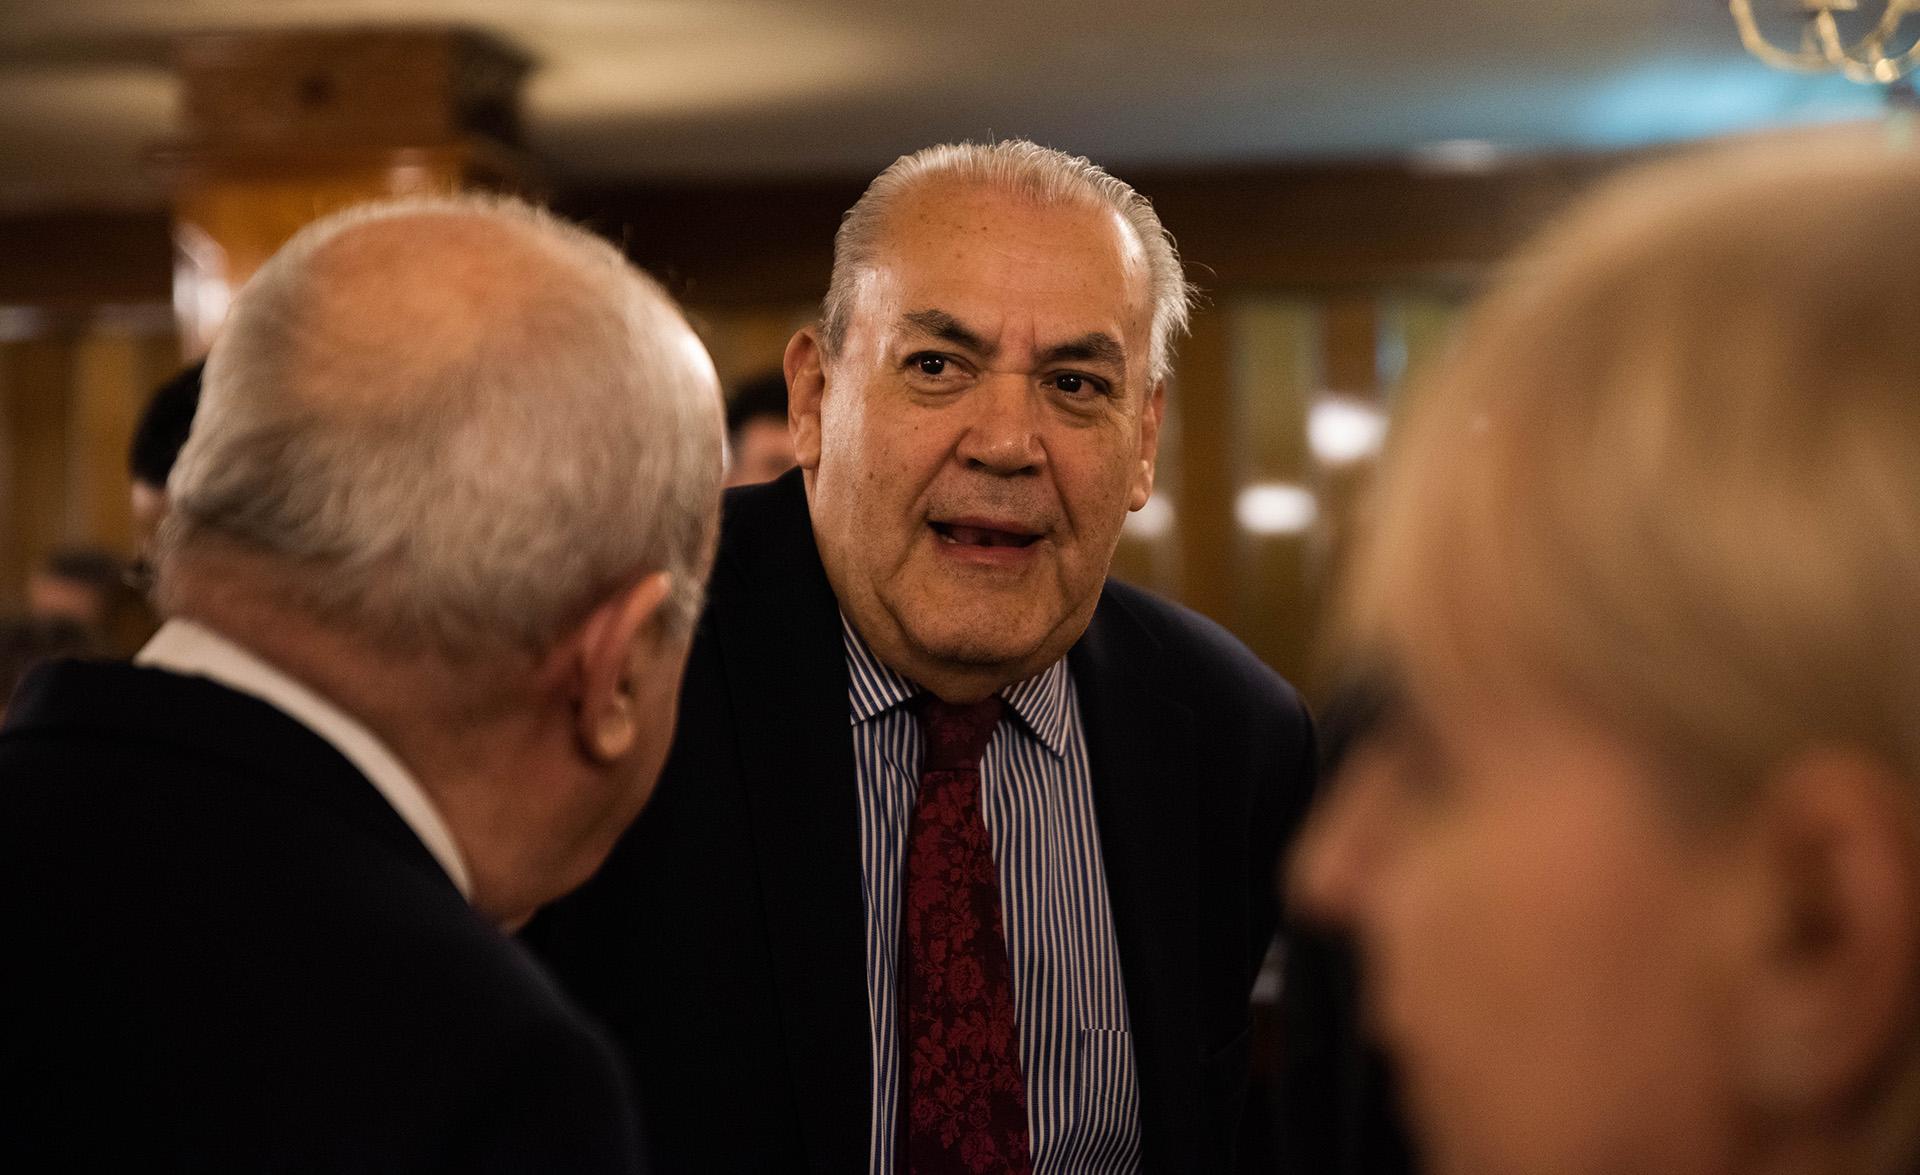 El periodista Ignacio Zuleta